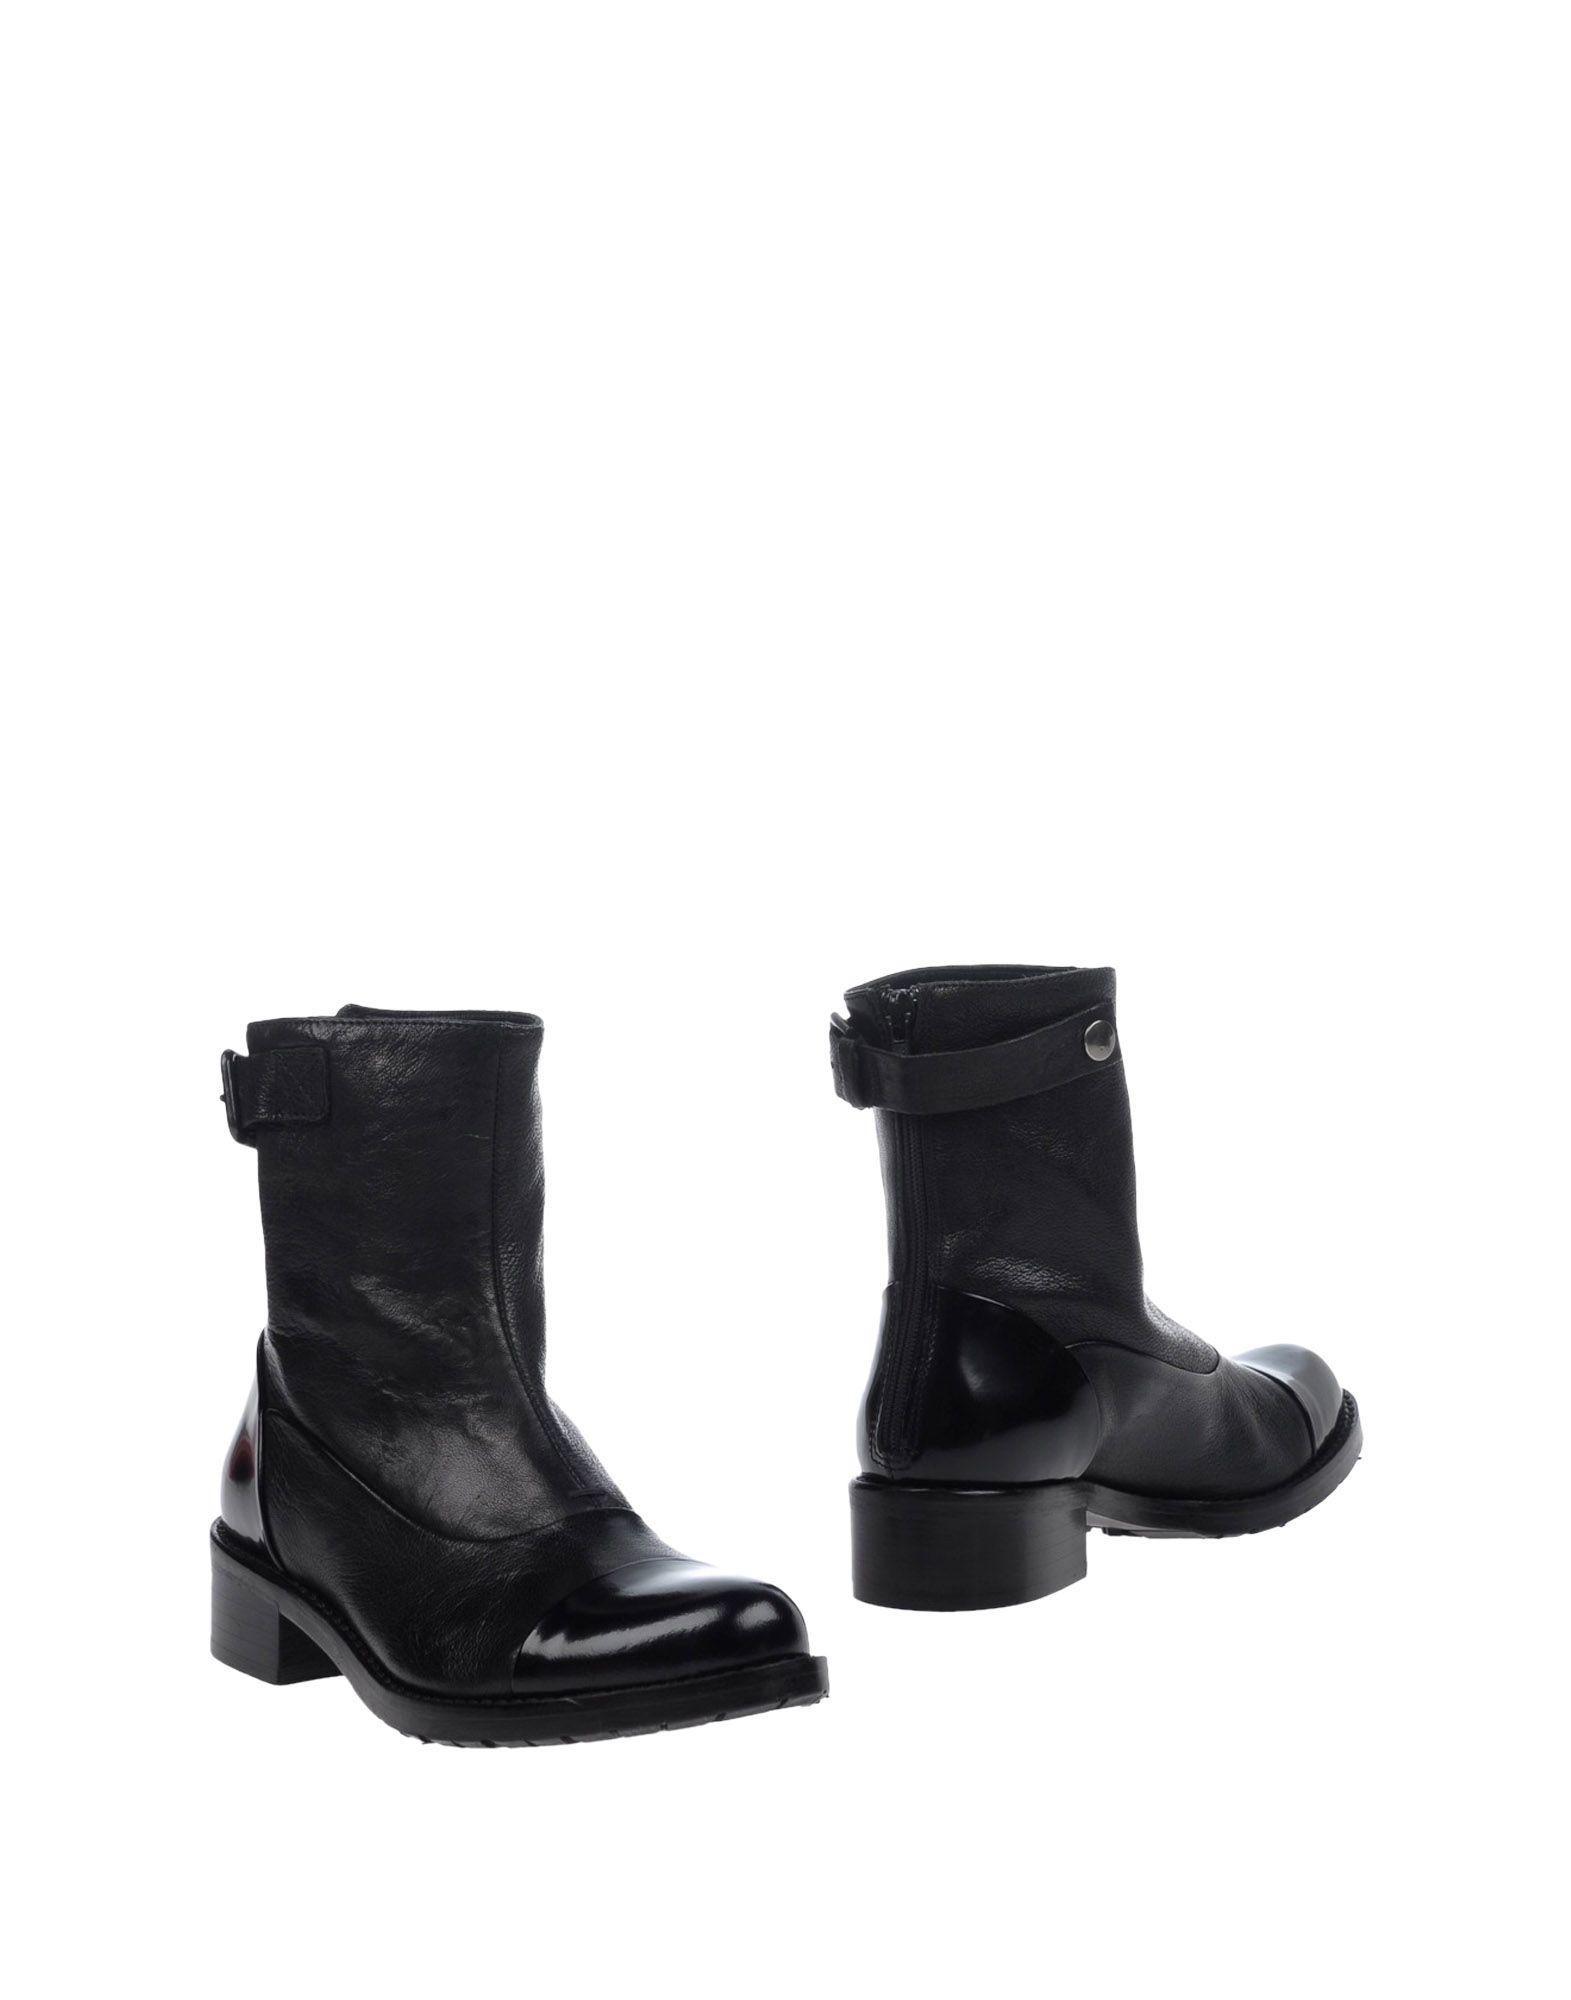 LOUIS GERARDIER Le Bottier Полусапоги и высокие ботинки louis gerardier le bottier обувь на шнурках